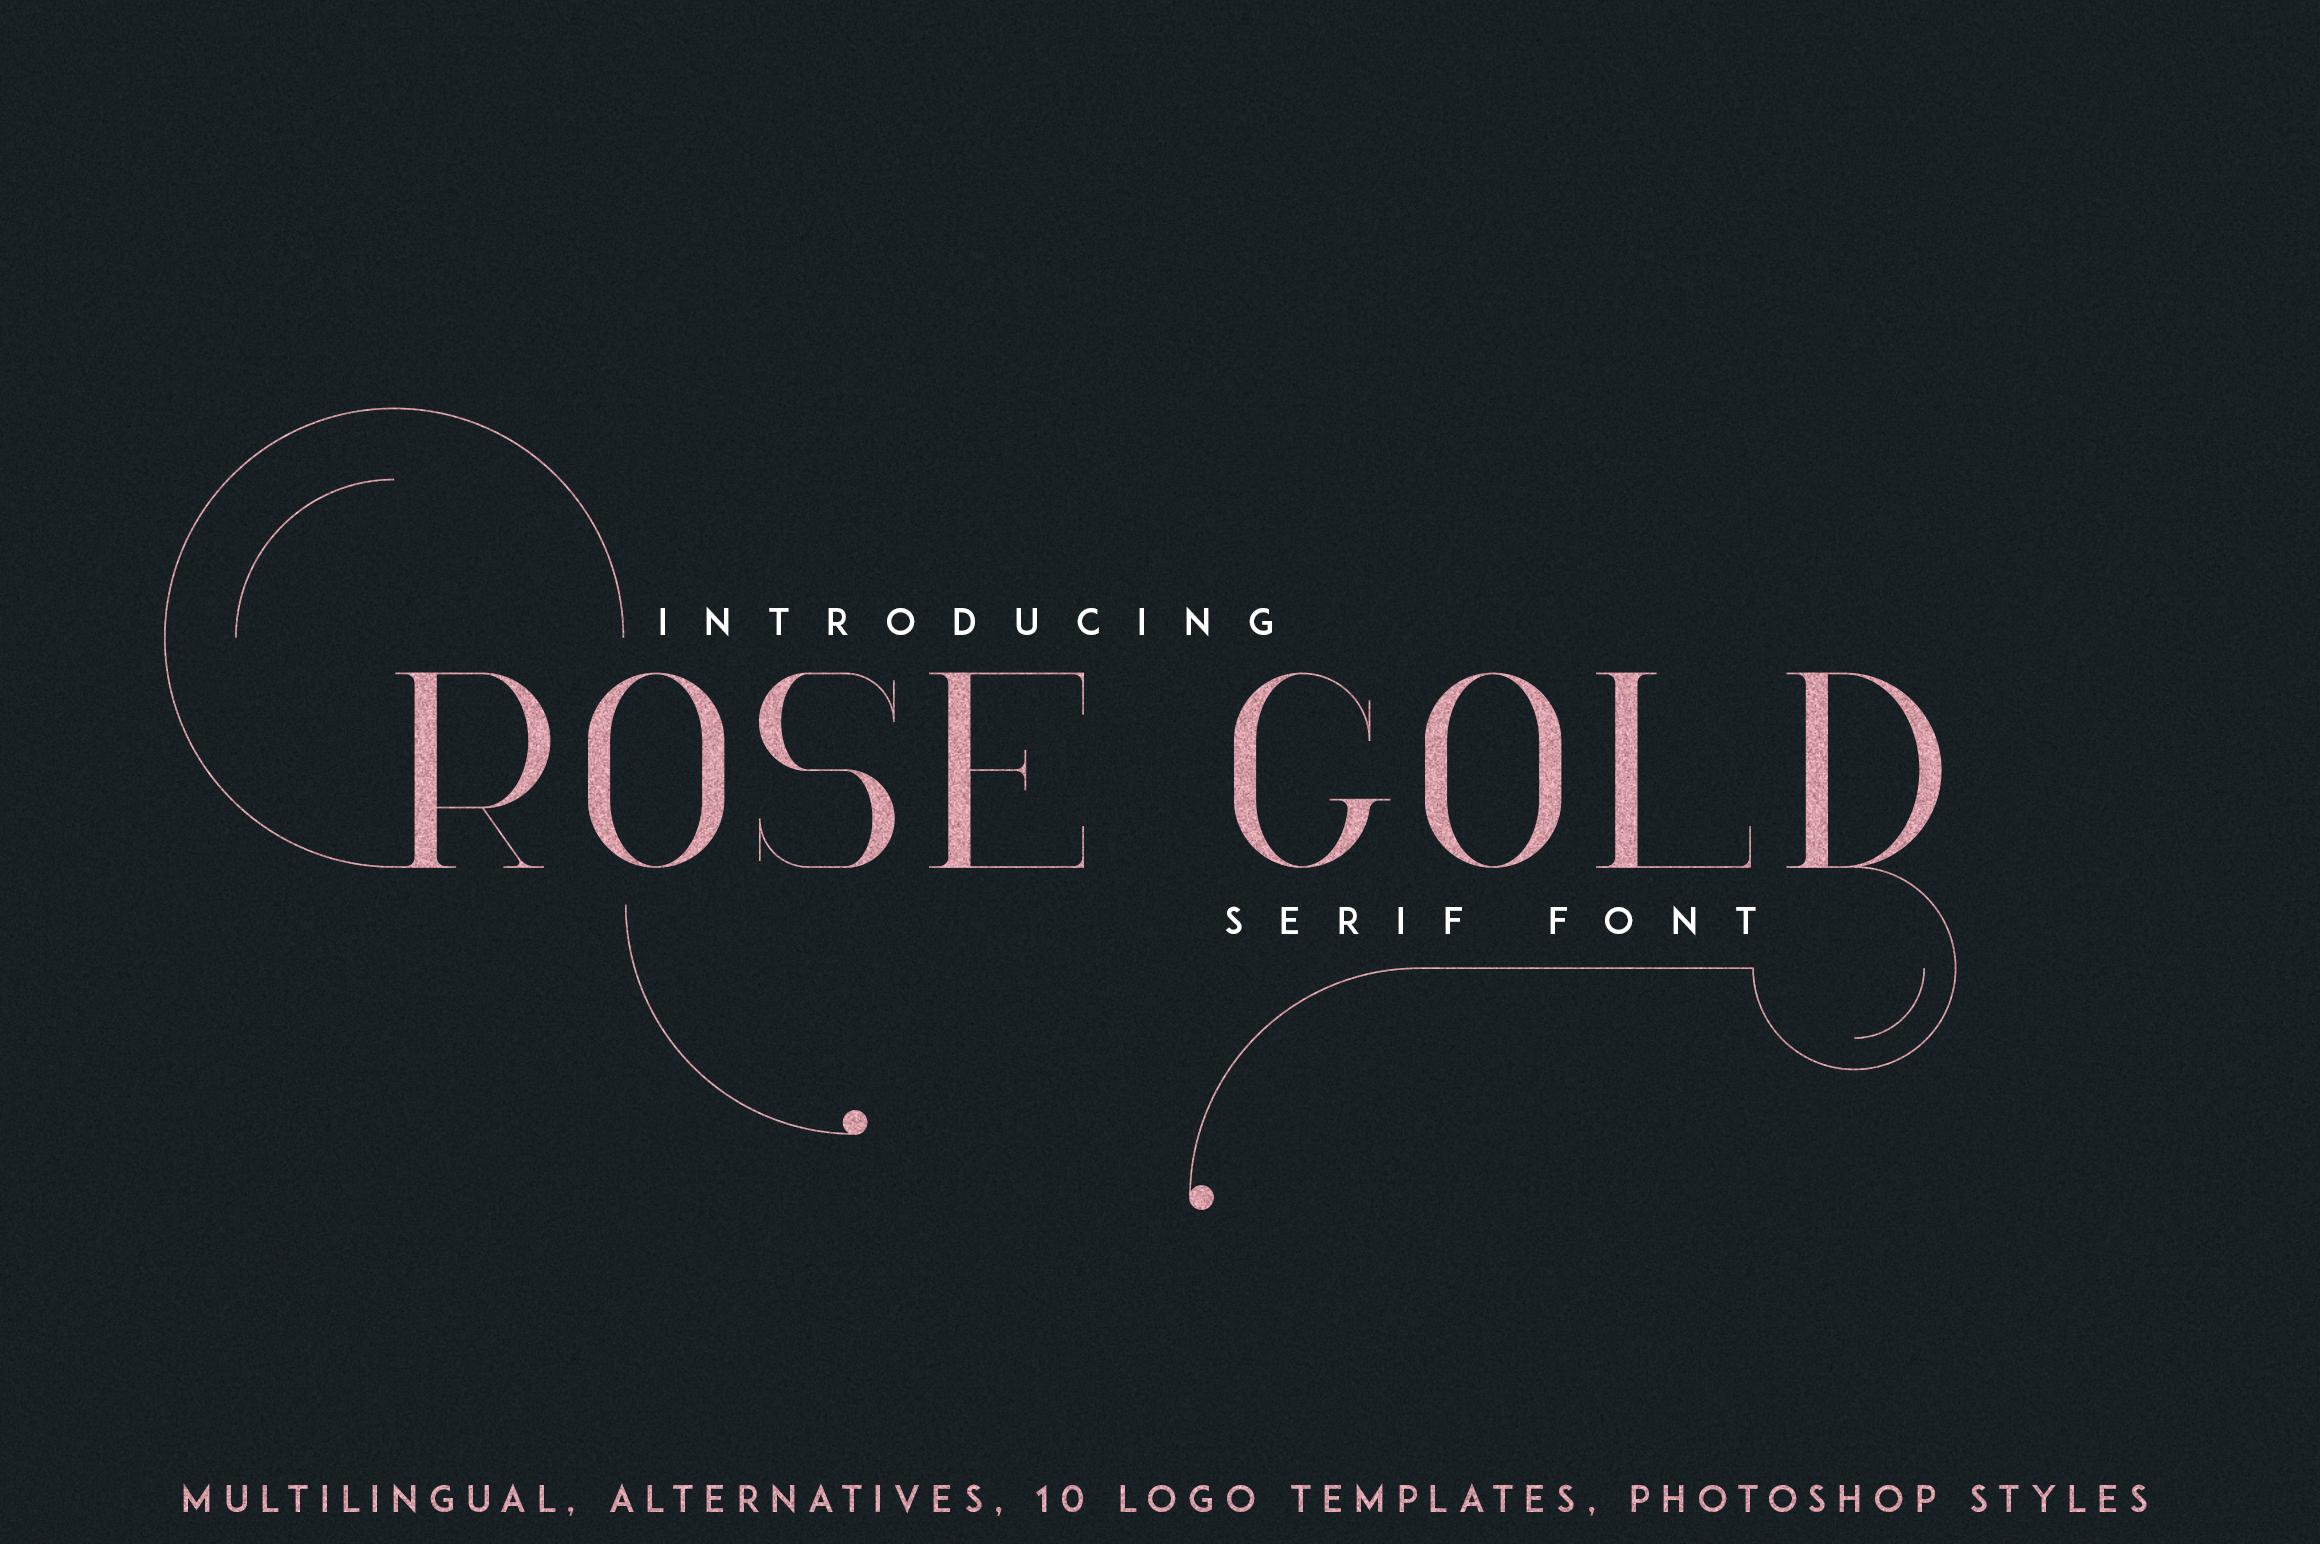 RoseGold Serif font 10 Logos example image 1